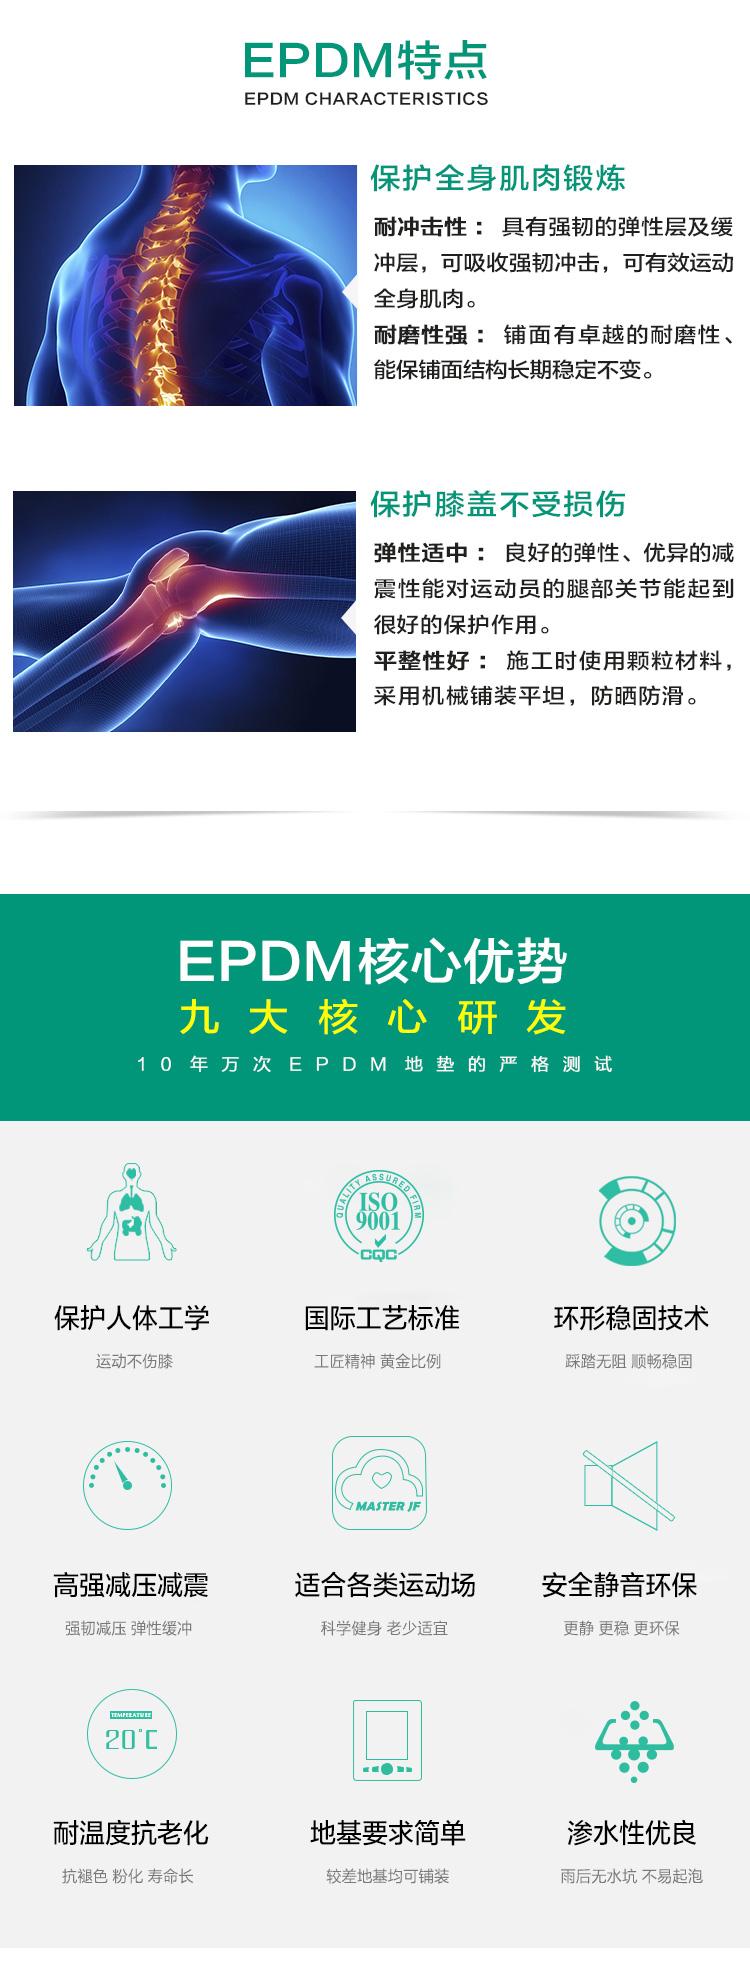 EPDM风大师19_04.jpg